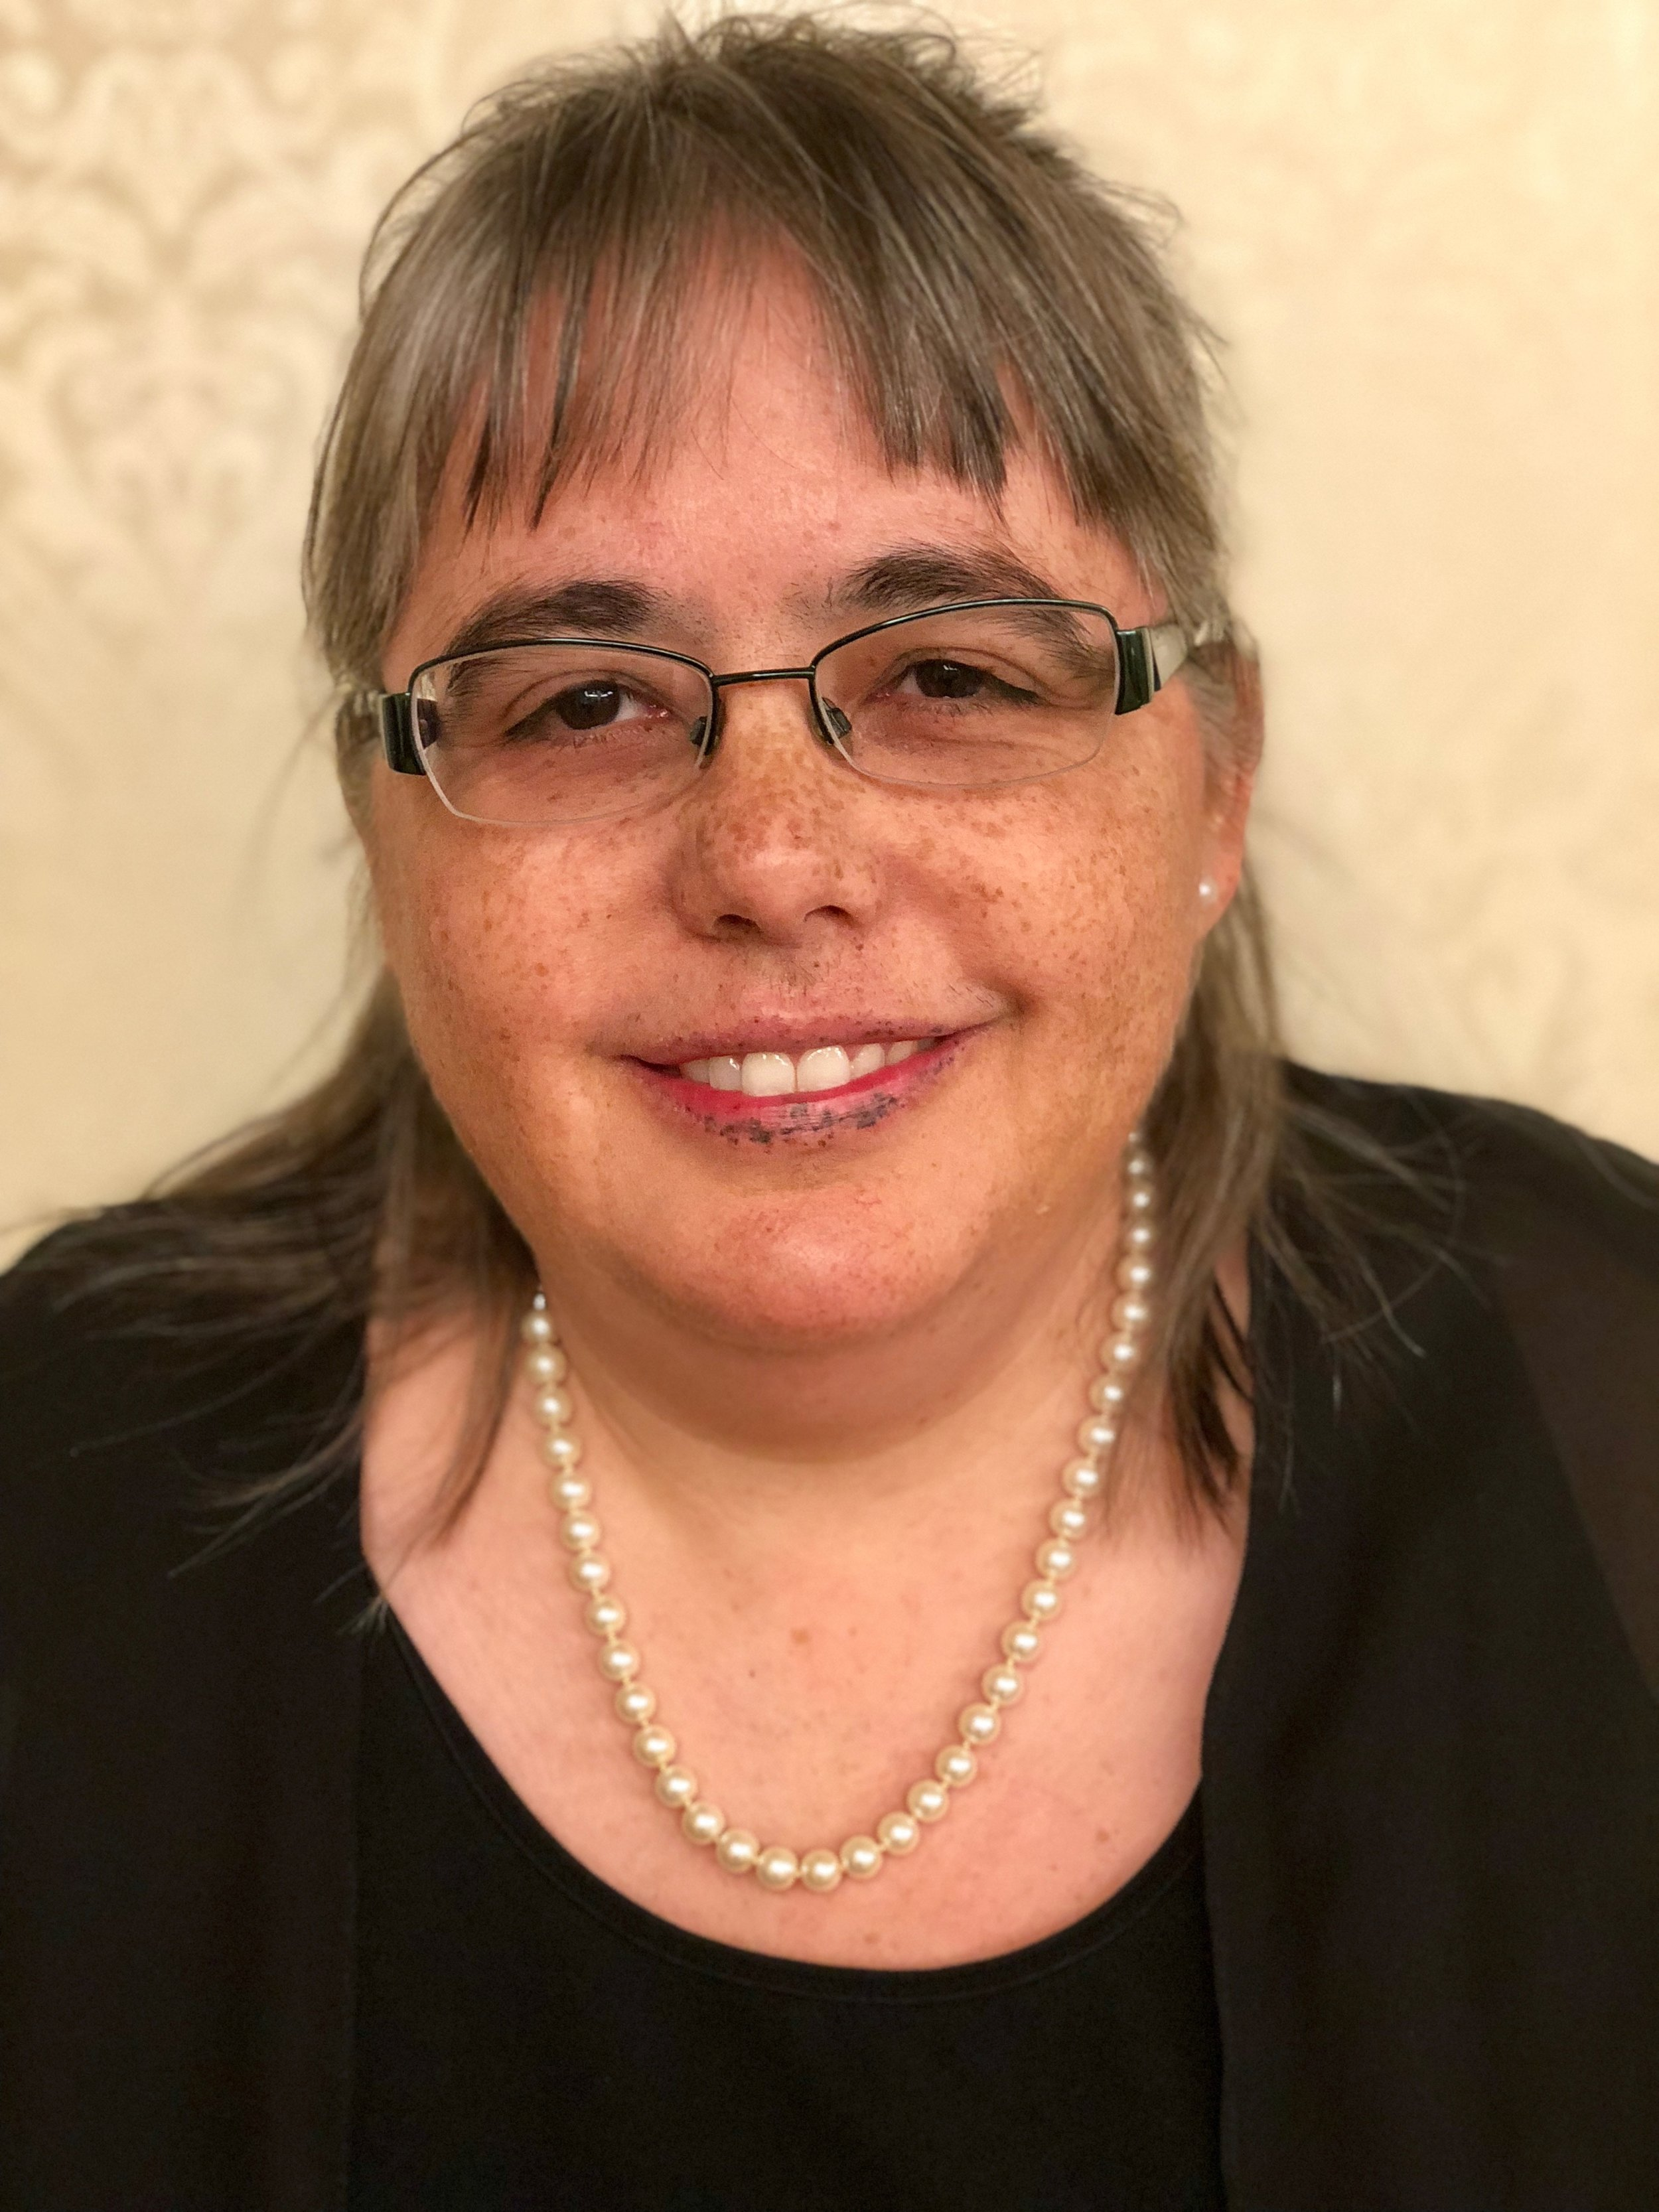 Jennifer Winstedt - Treasurer